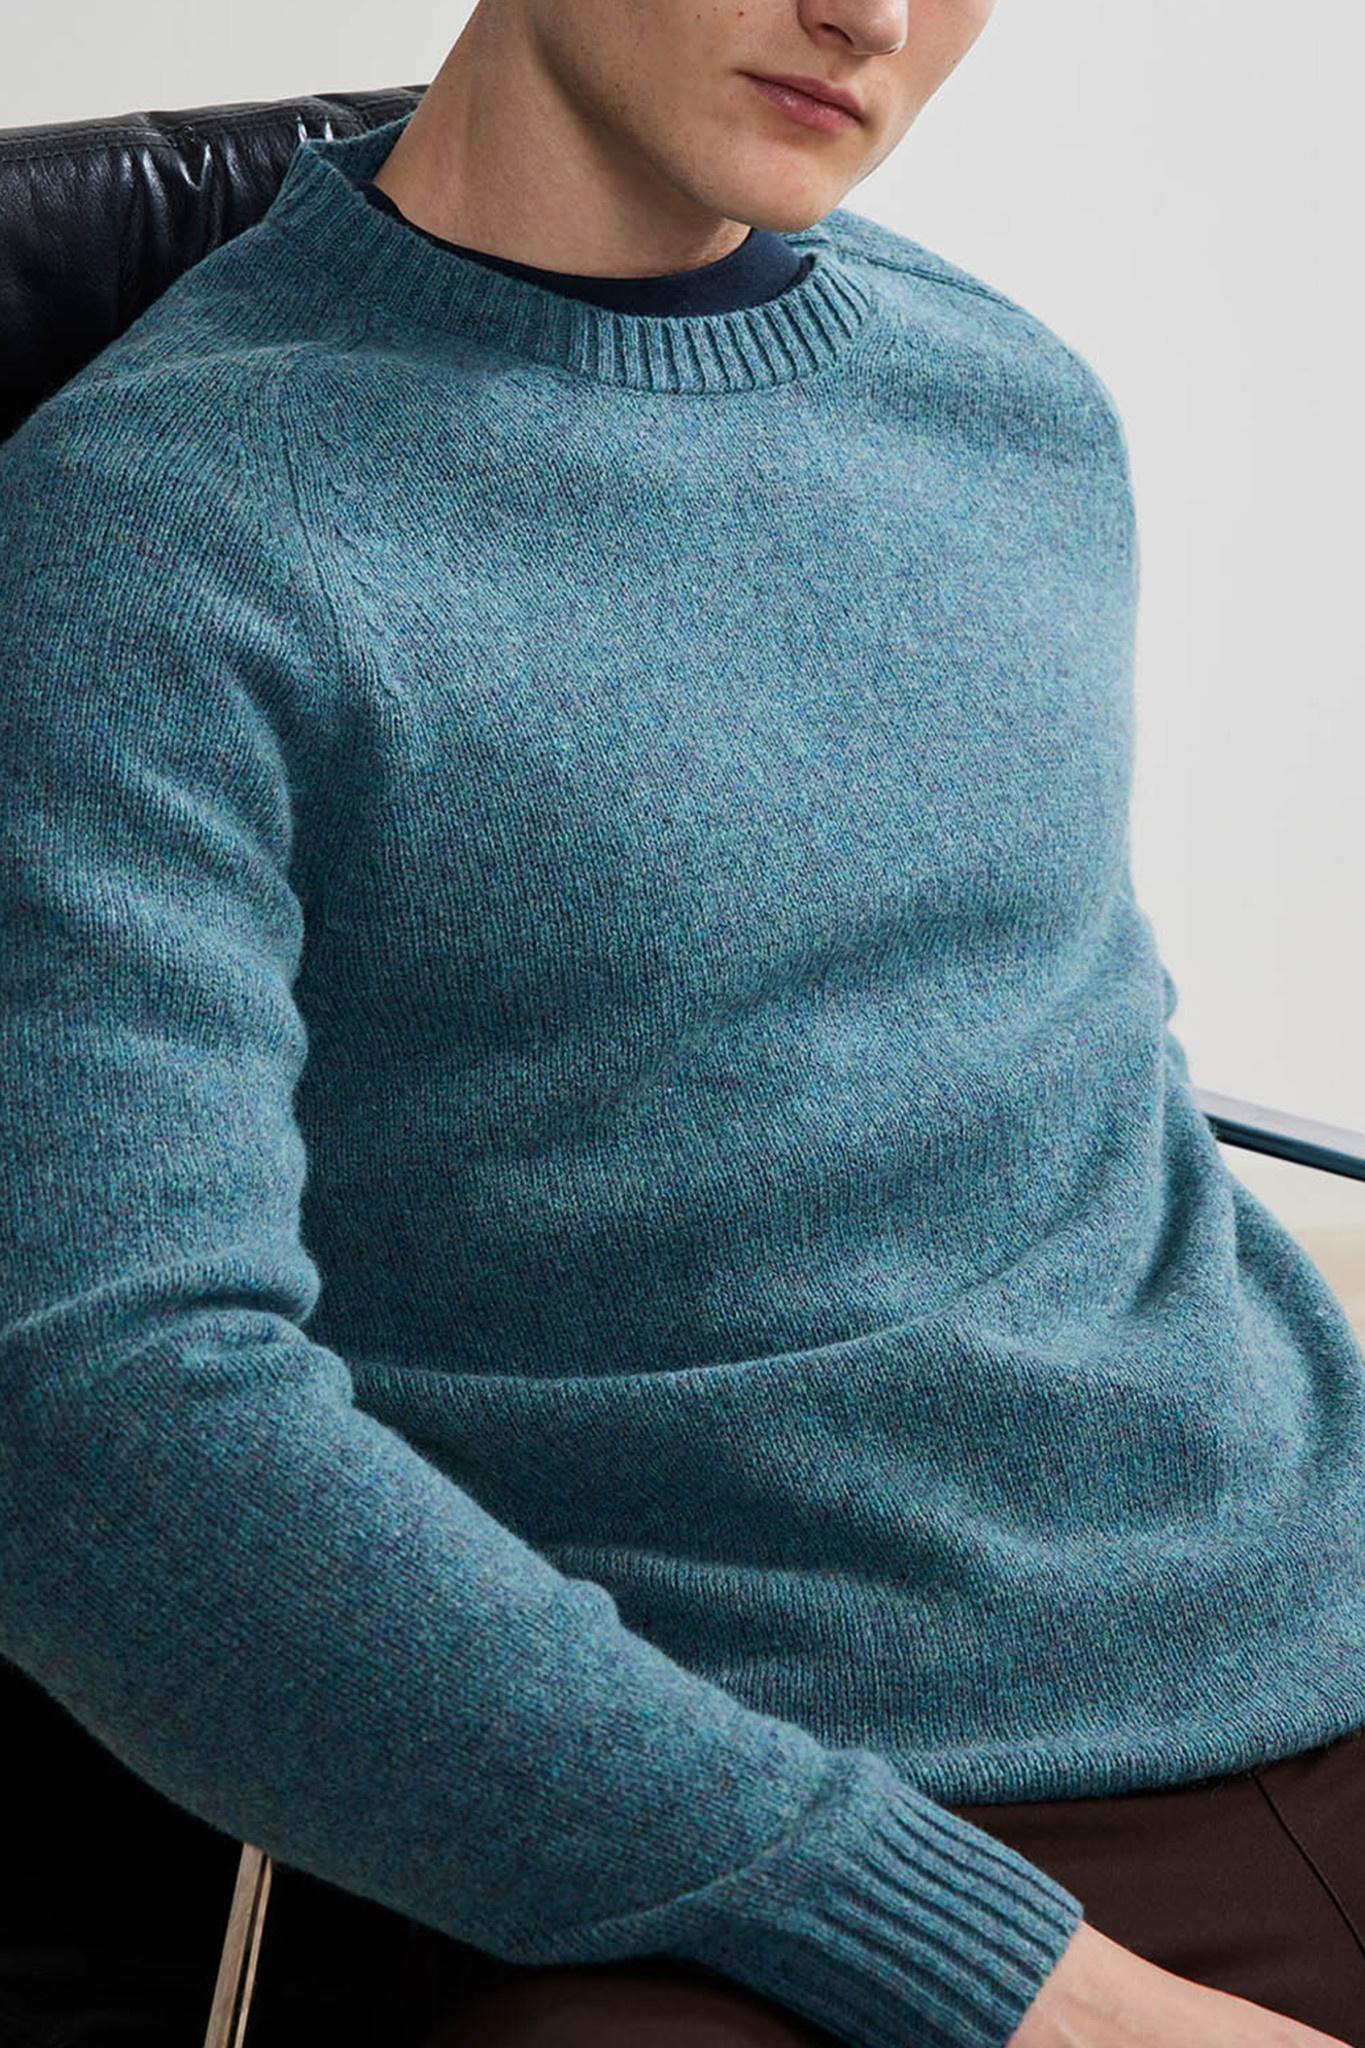 Nathan Knitwear - Ocean Blue-1